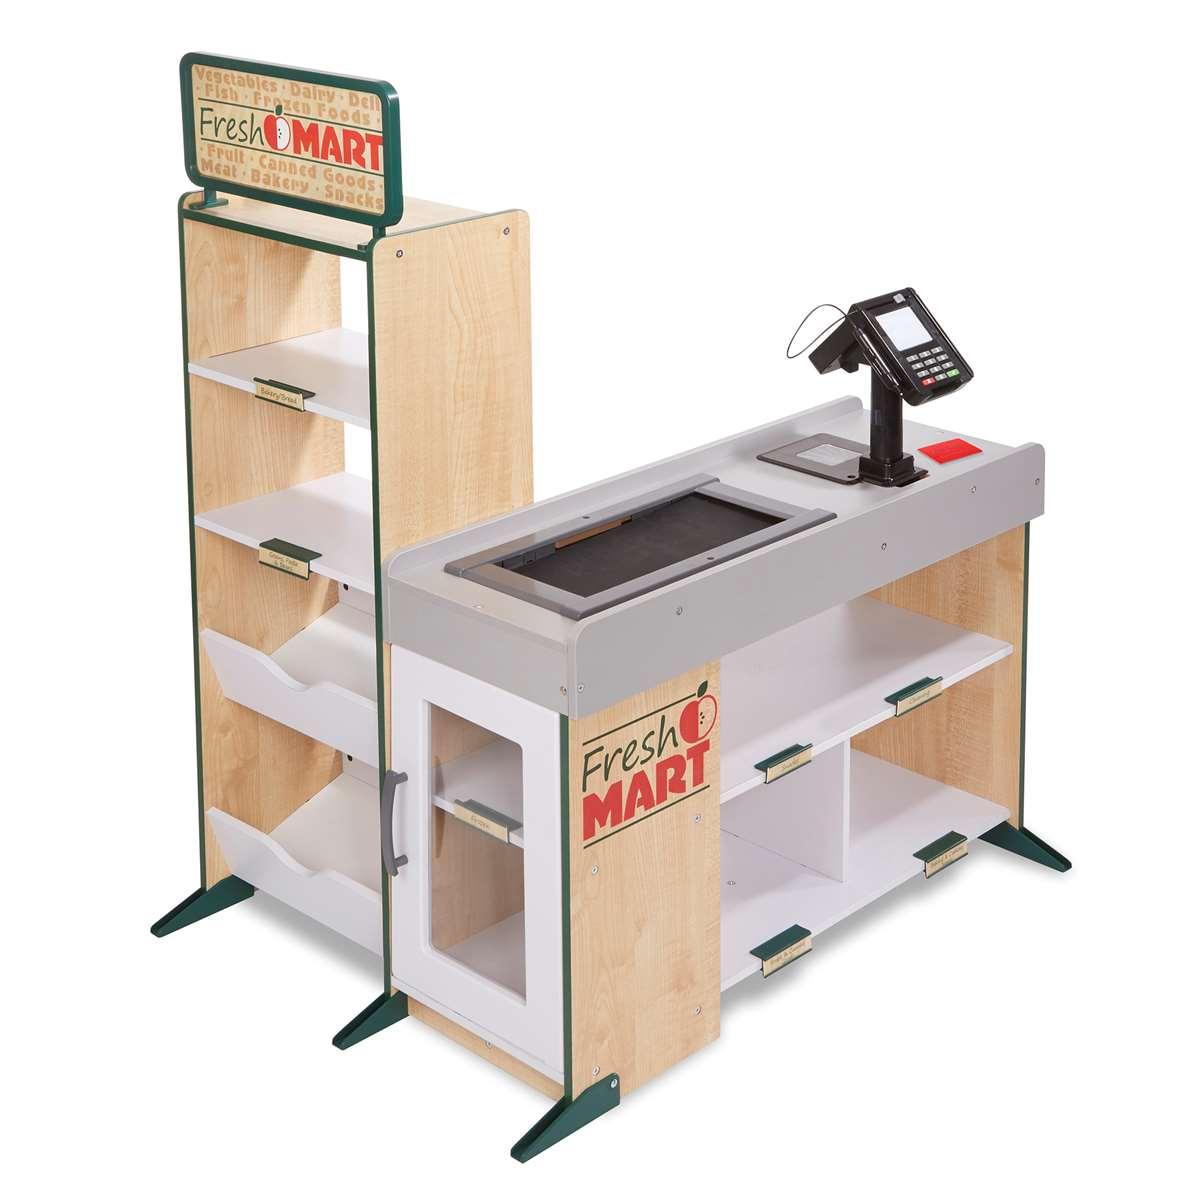 Fresh Mart Grocery Store - LCI9340